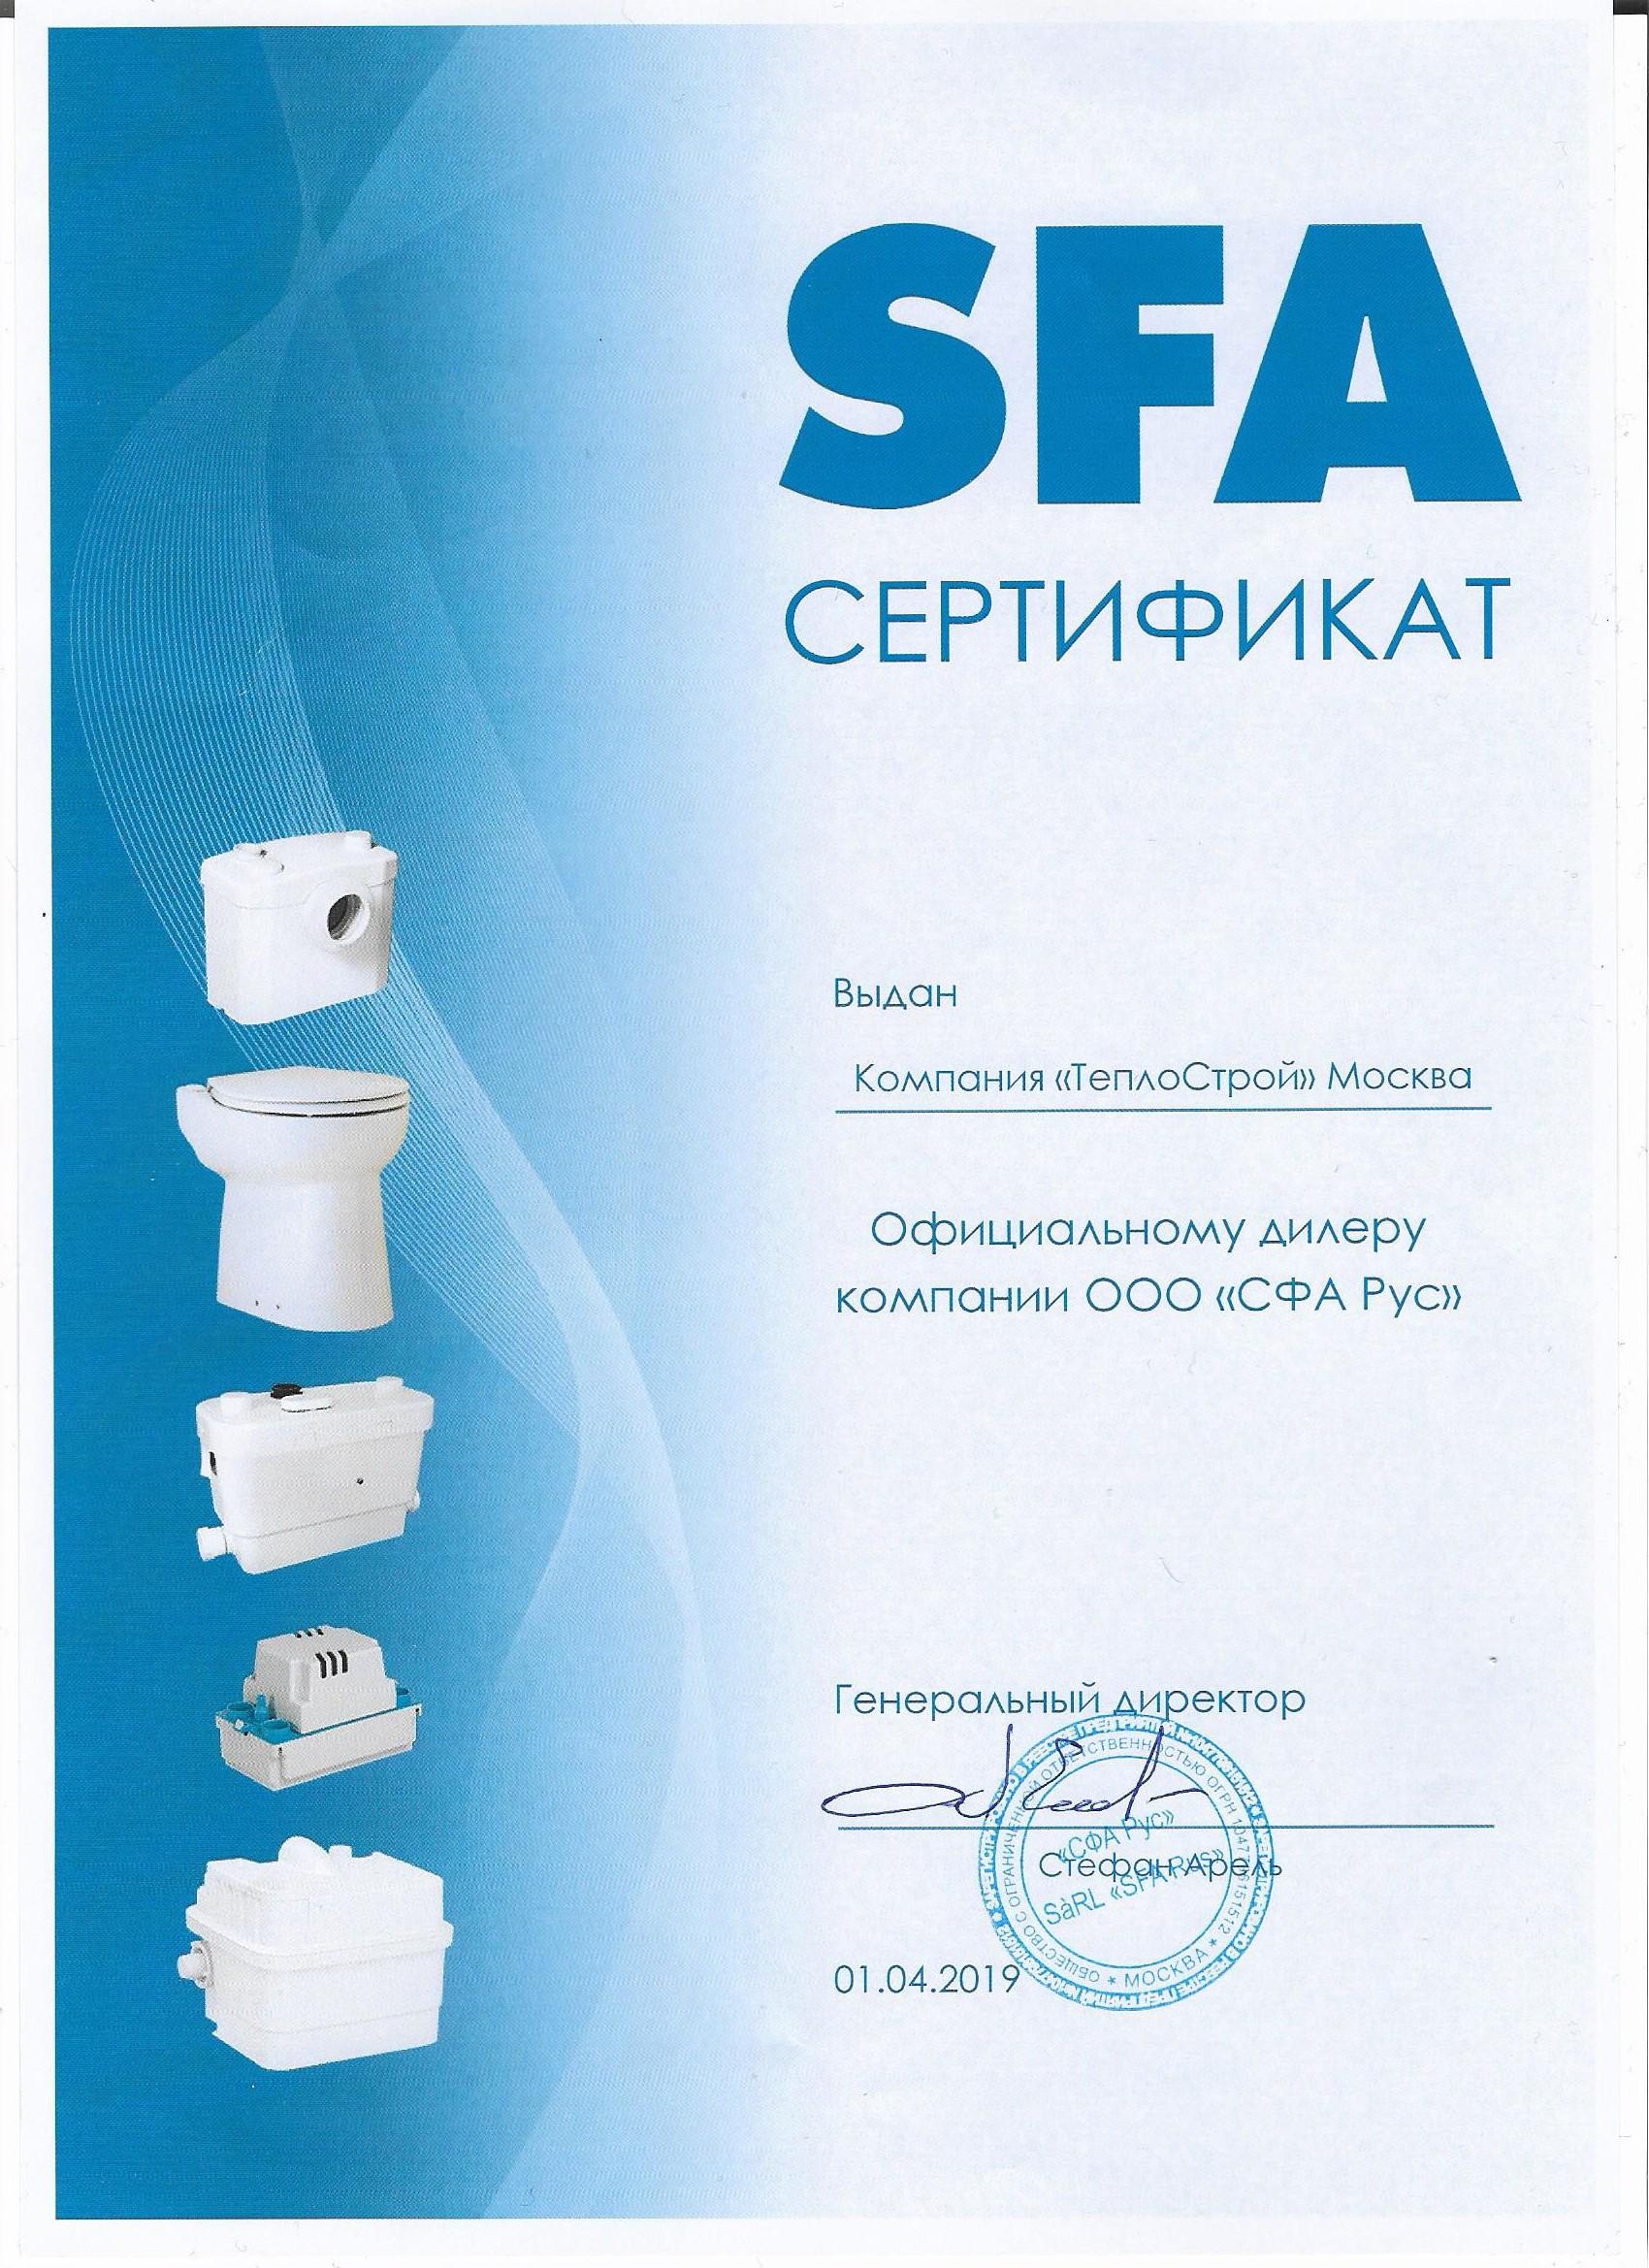 SFA Сертификат